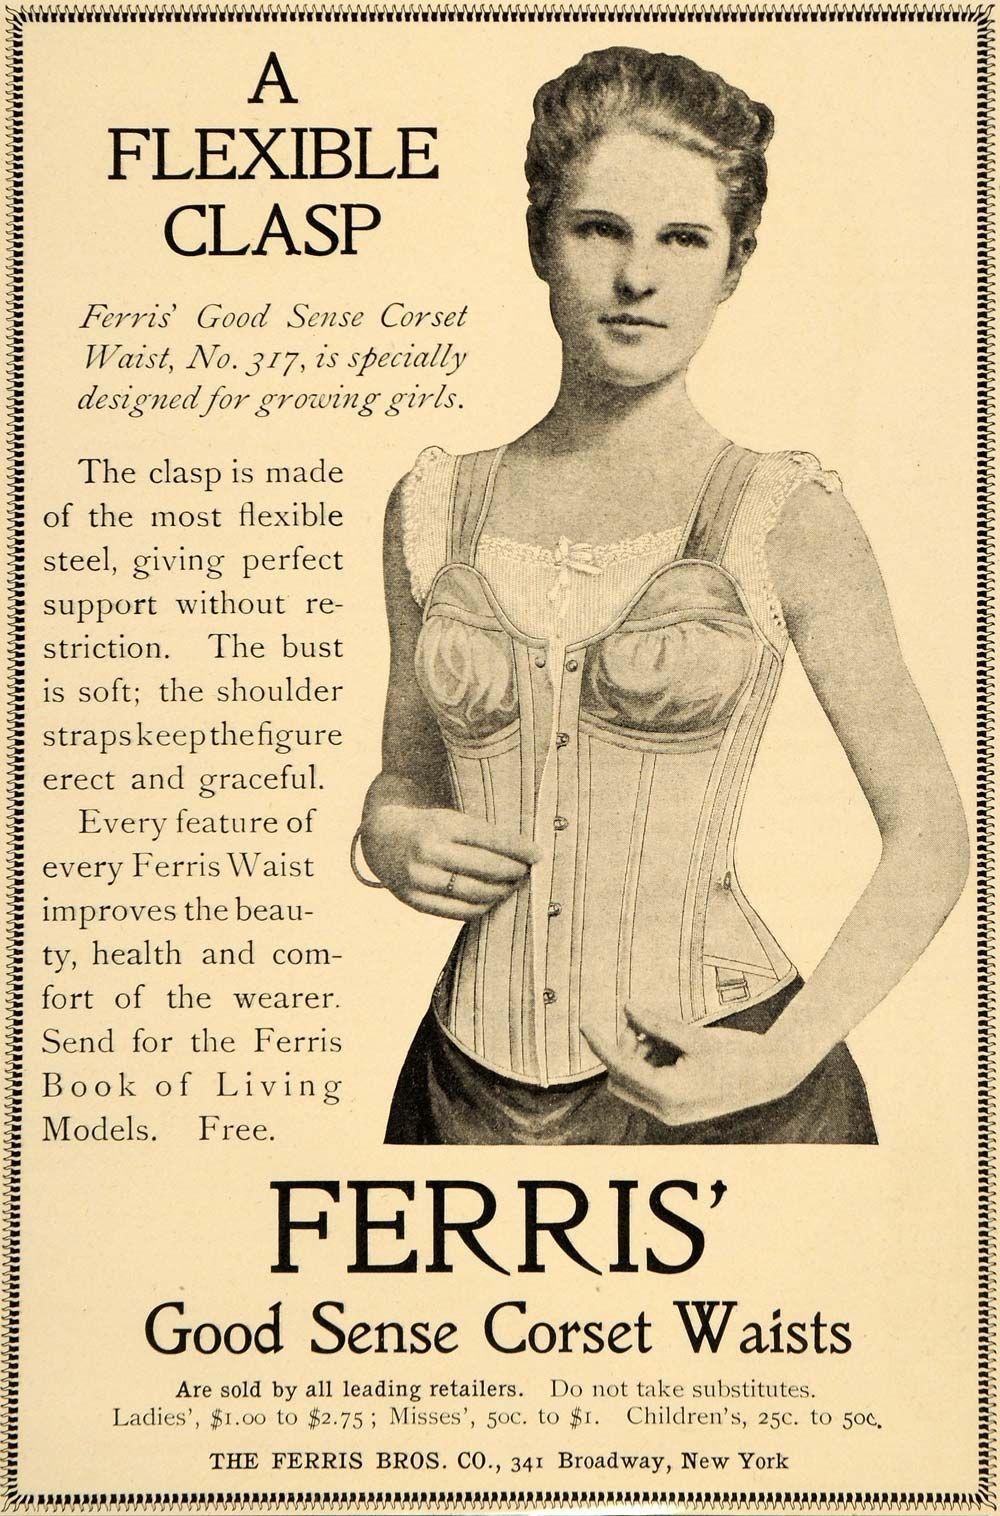 49e8f24371f11 1900 Ad Ferris Corset Waist Clothing Fashion No 317 - ORIGINAL ...